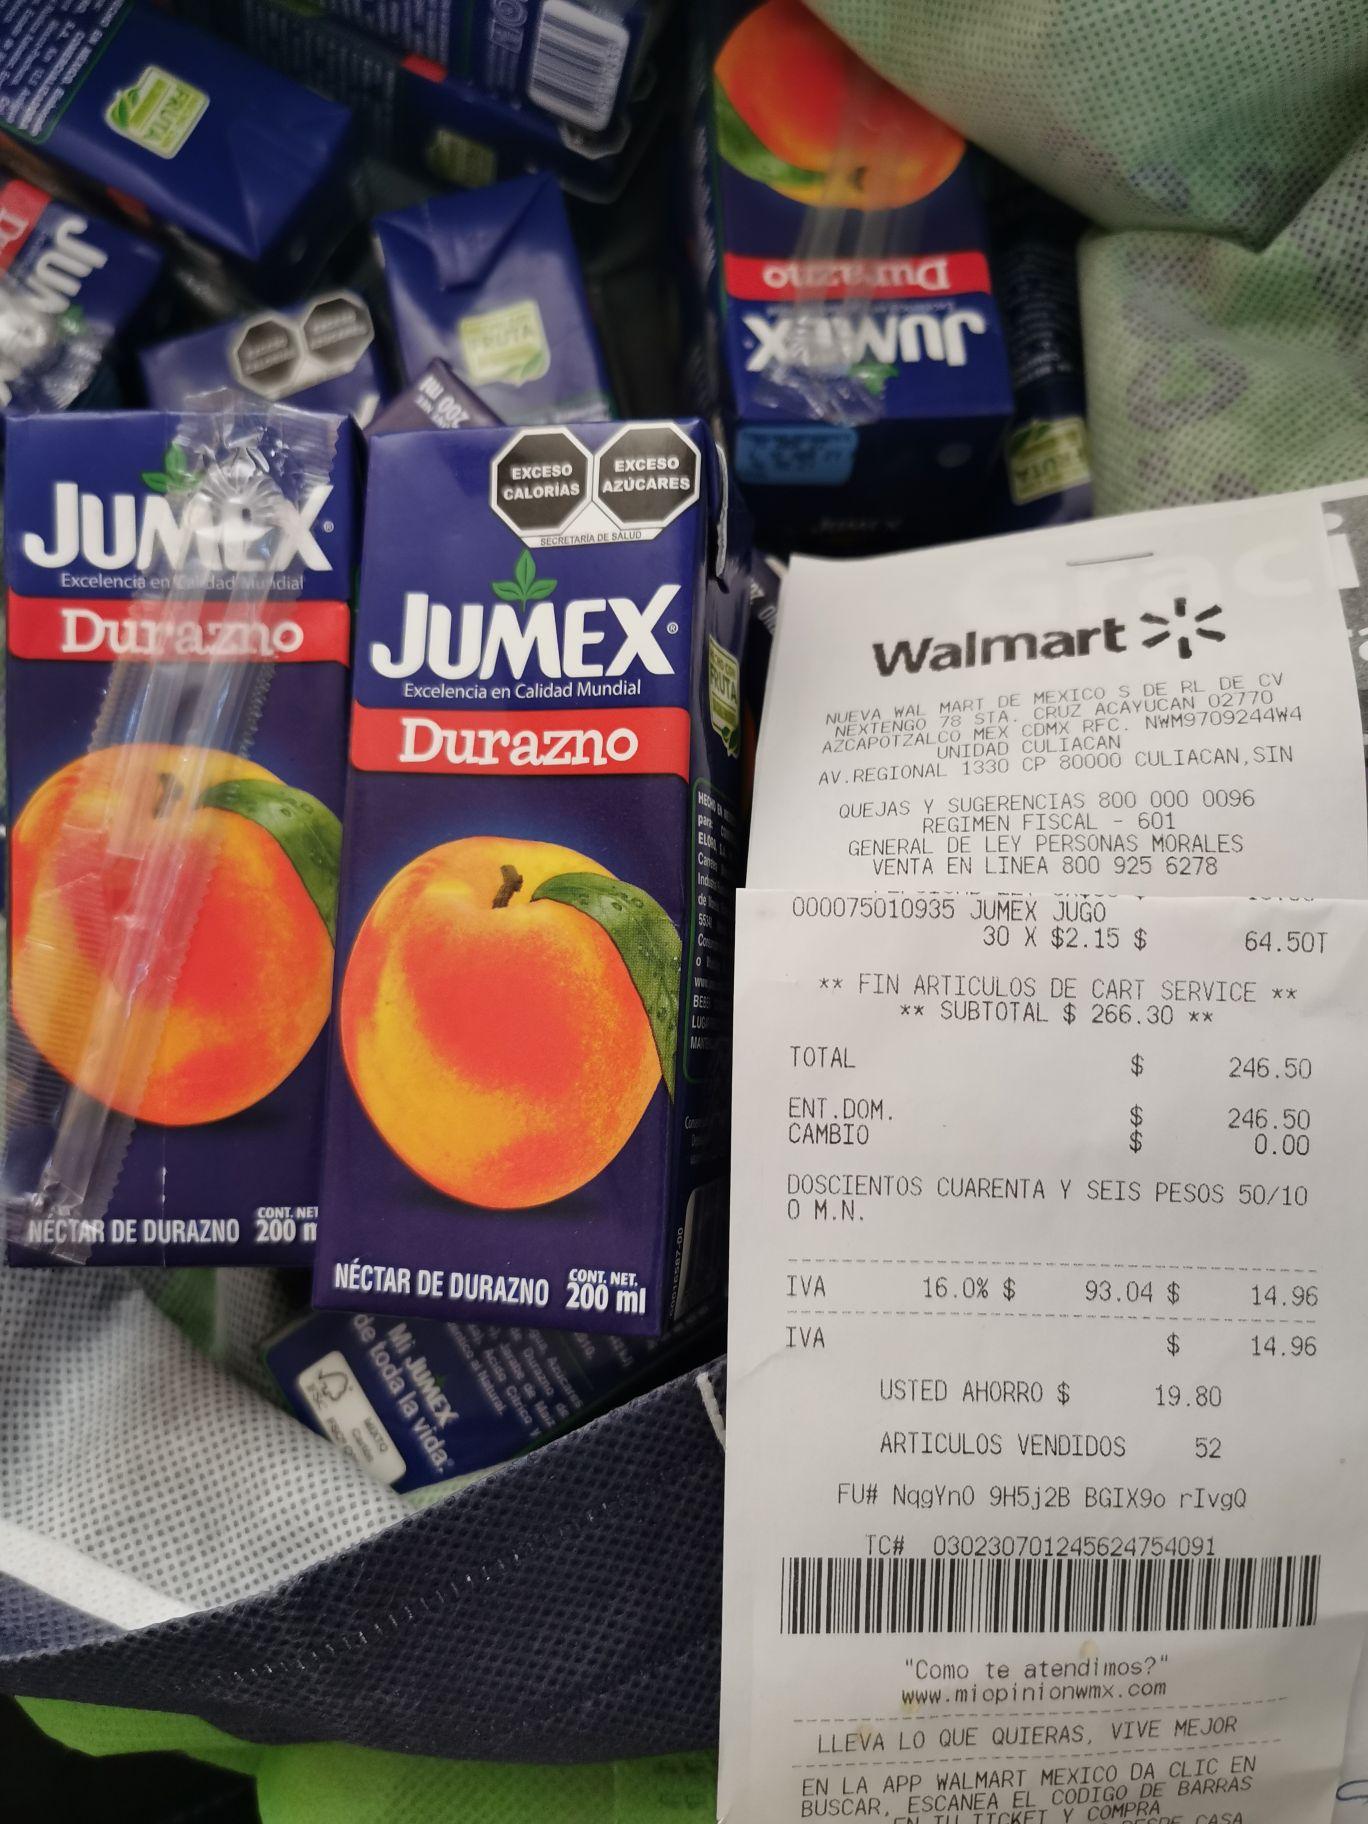 Walmart Culiacán: Jugo Jumex Durazno de 200ml